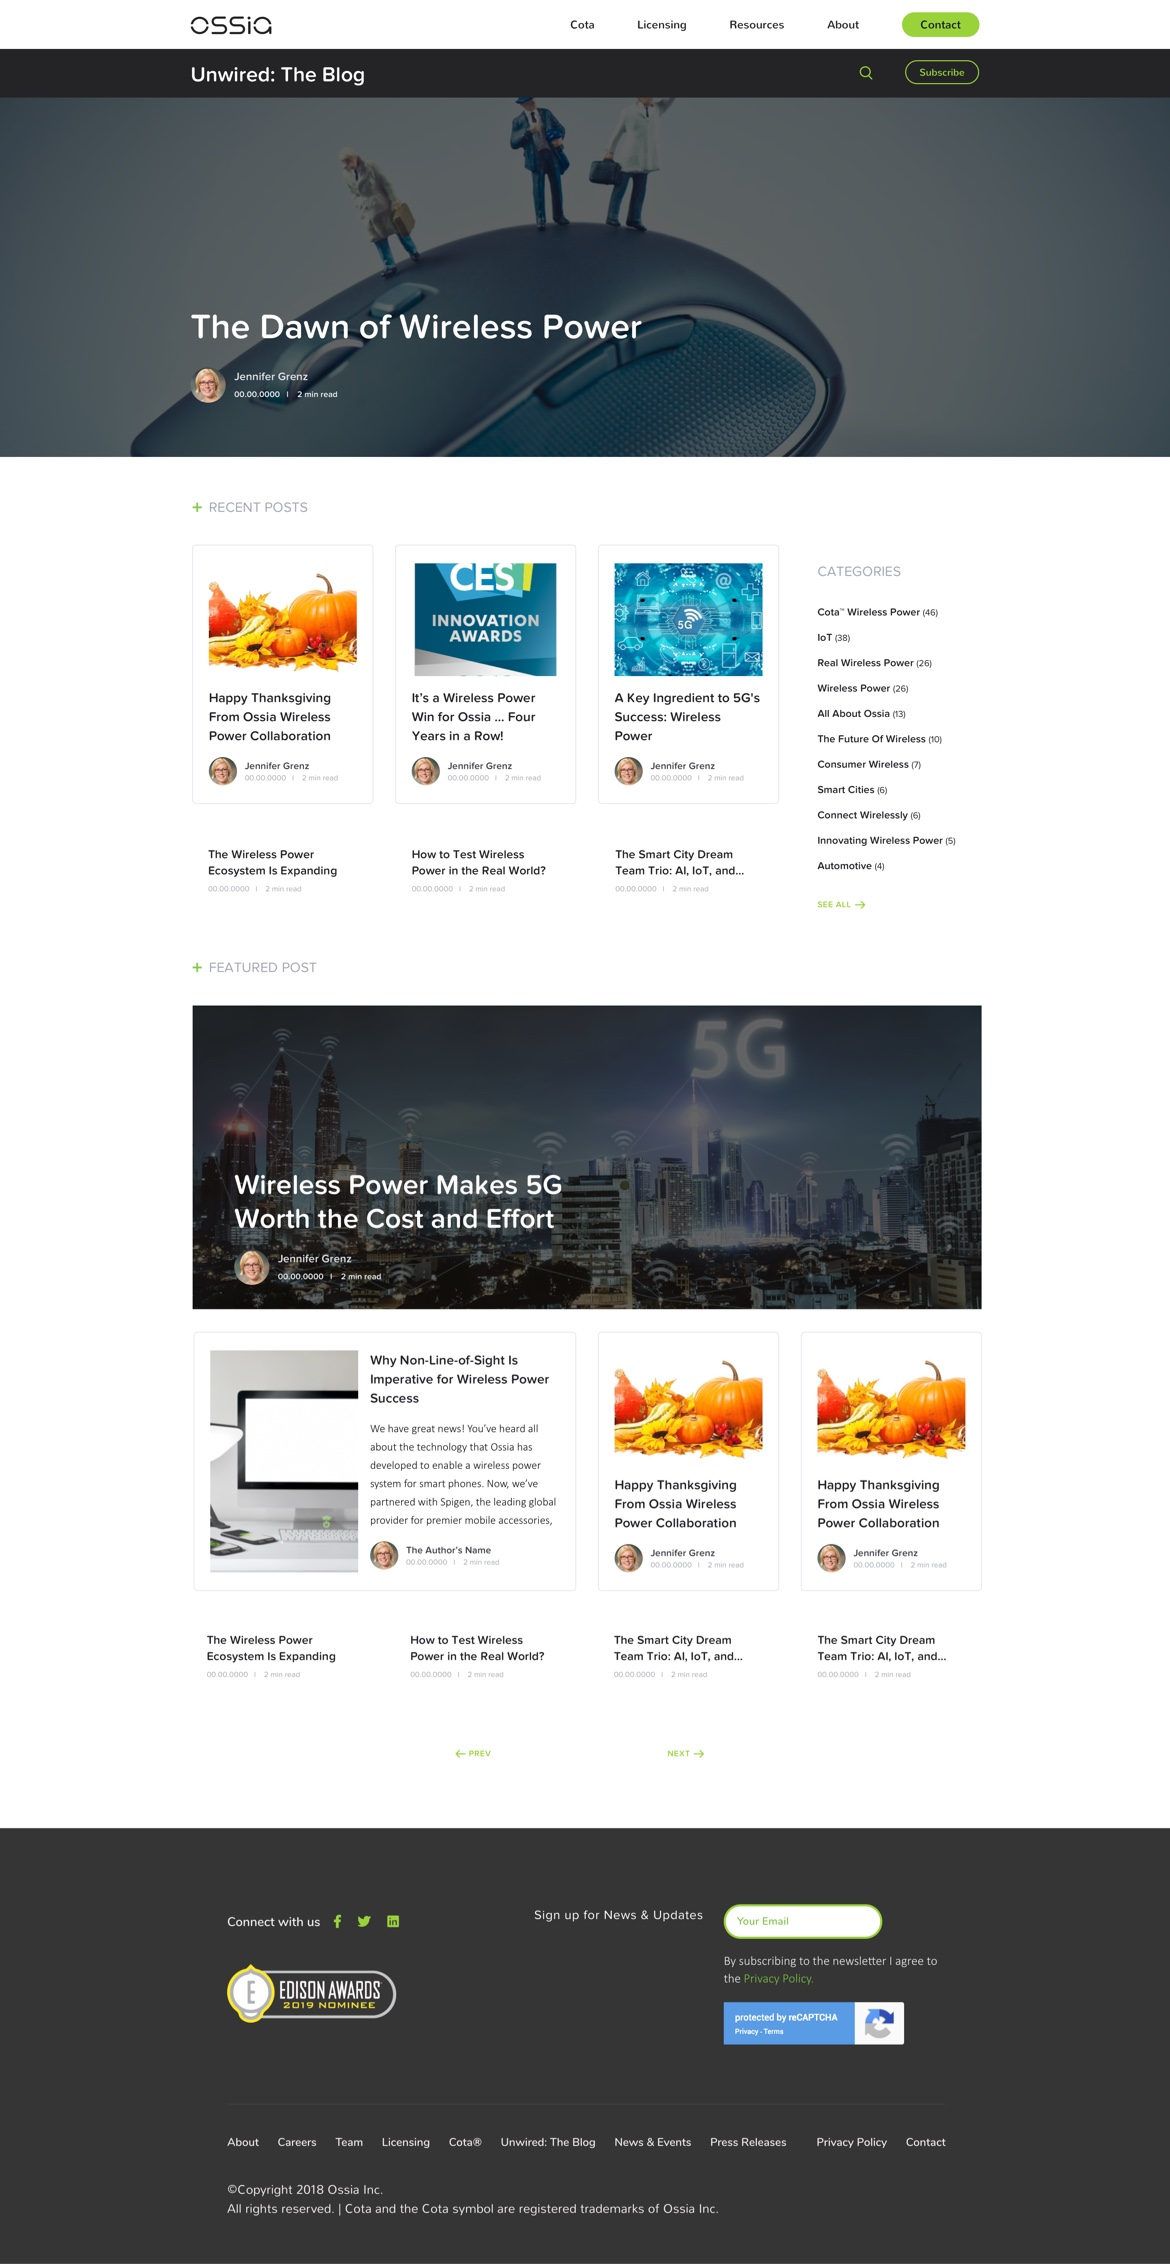 ossia-homepage